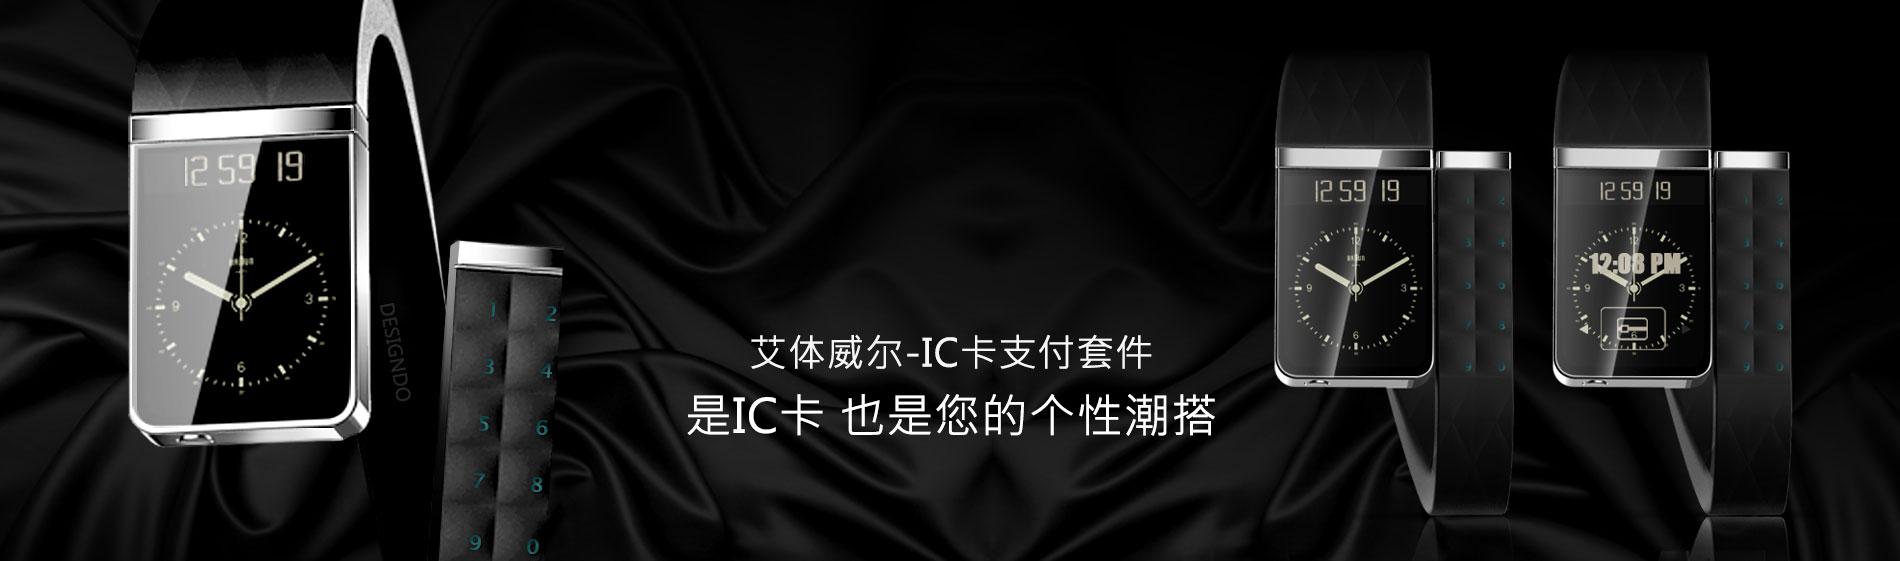 IC卡支付套件_产品设计-来设计